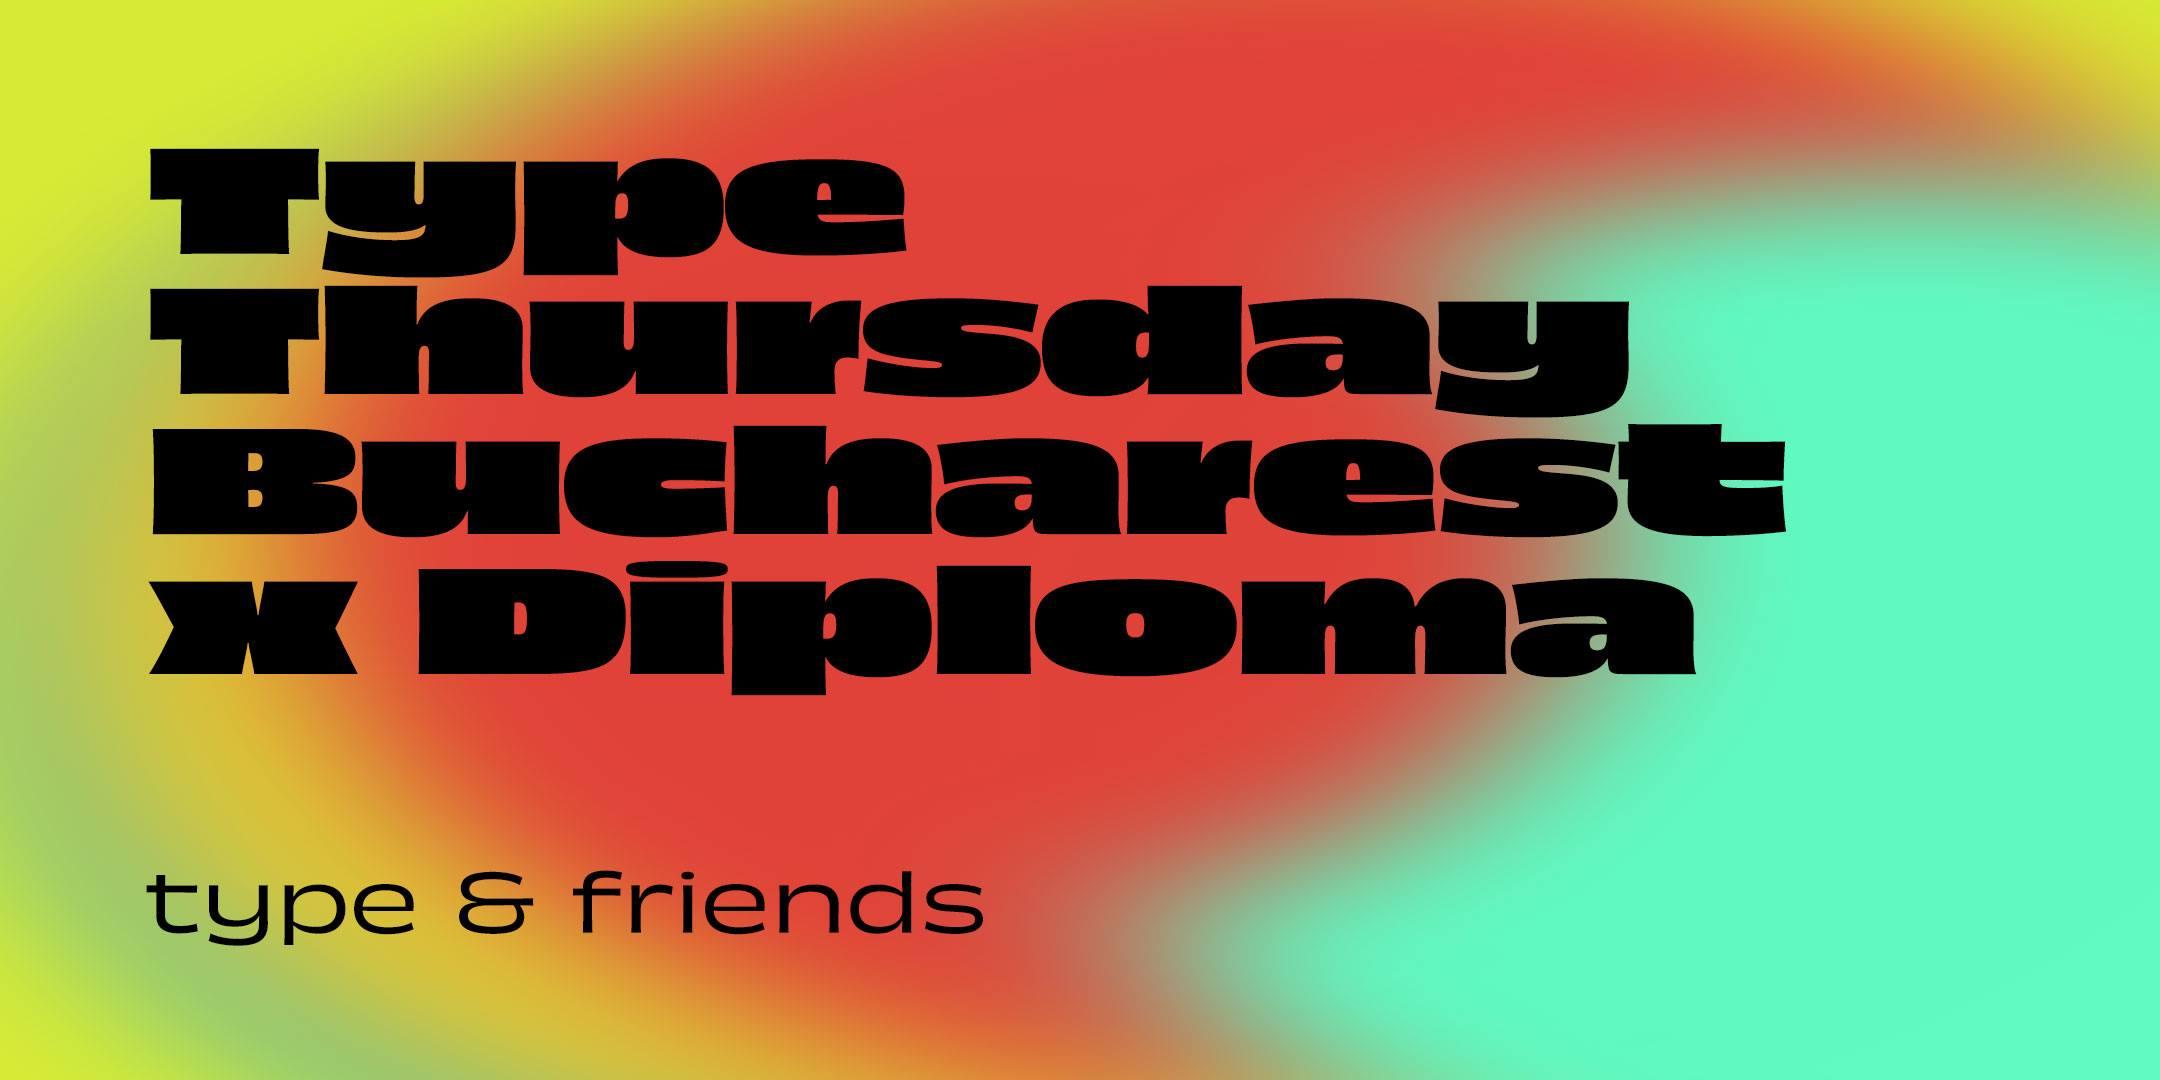 TypeThursday Bucharest x Diploma